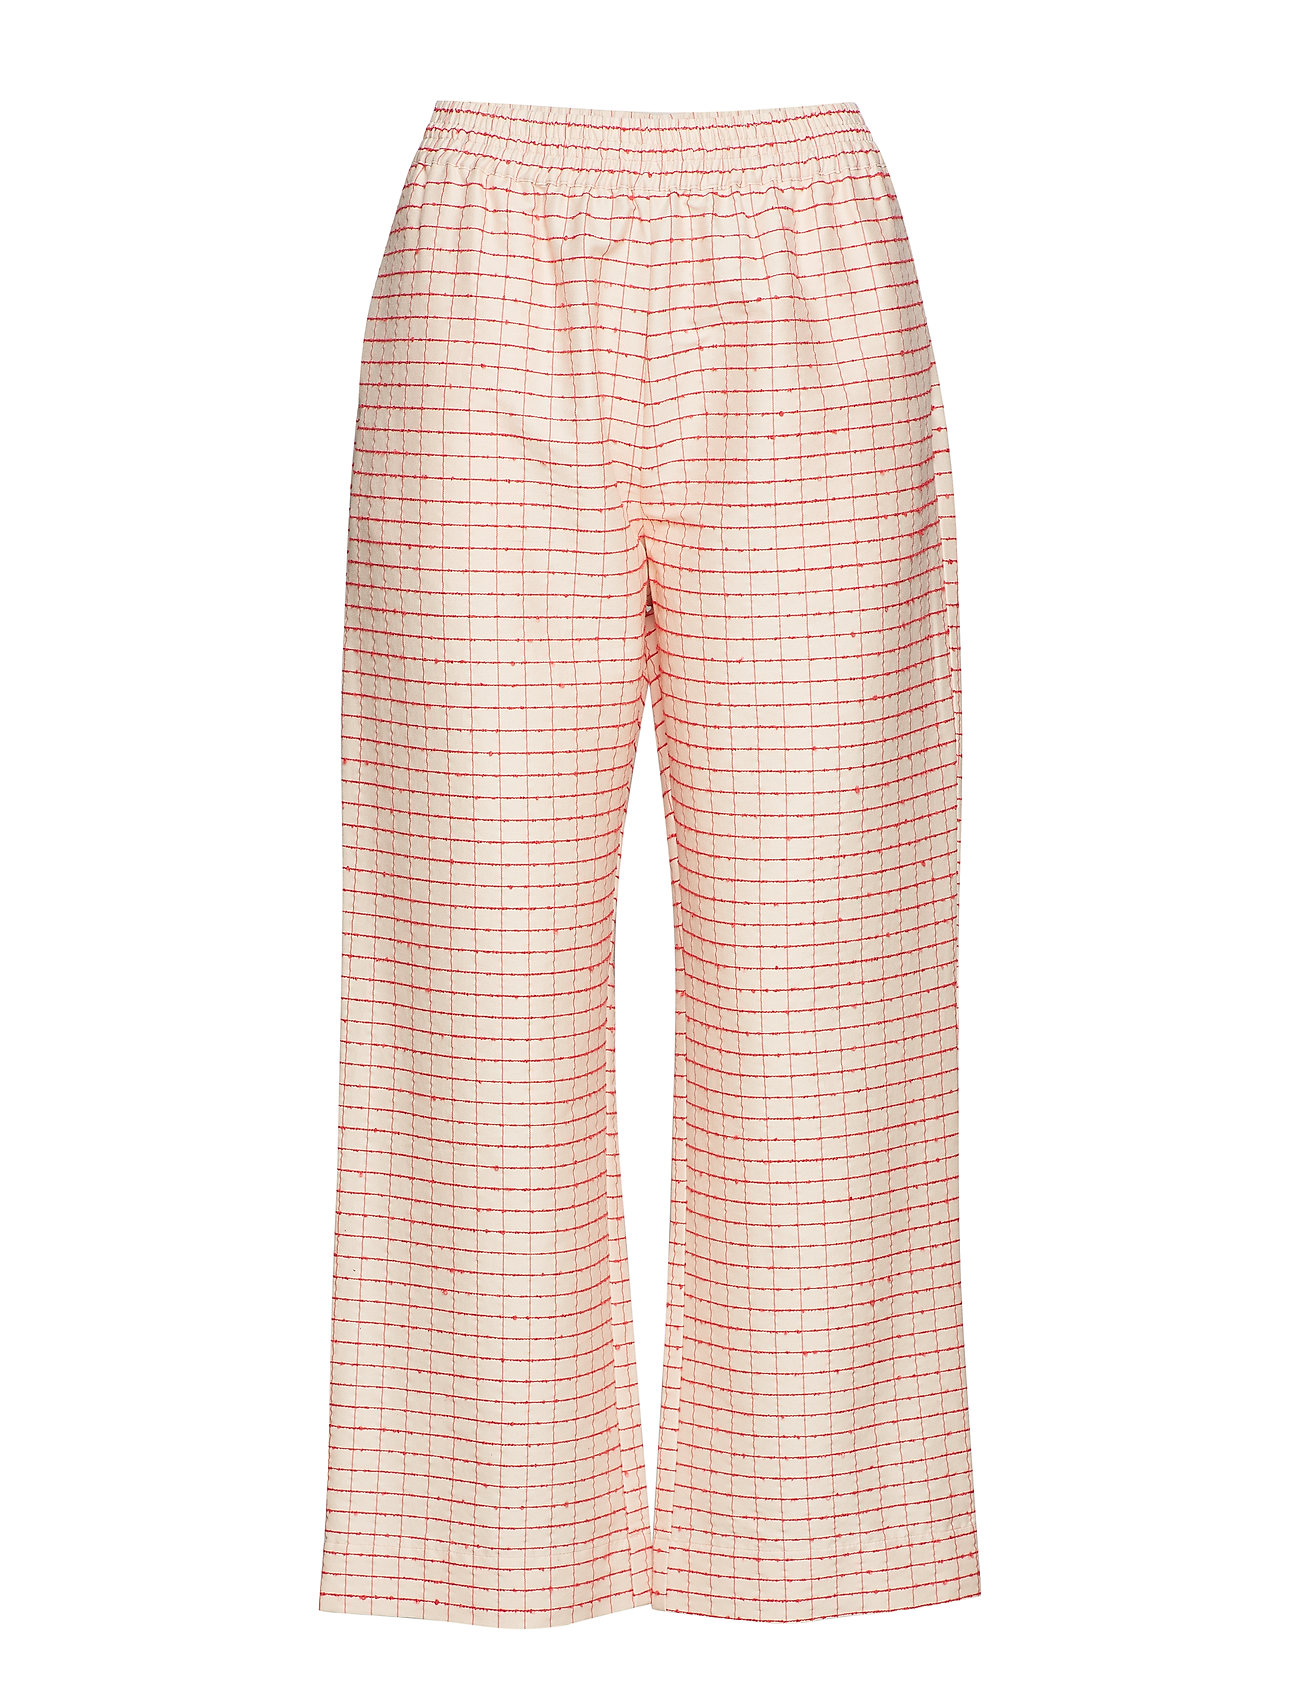 STINE GOYA Debra, 522 Woven Cotton Byxor